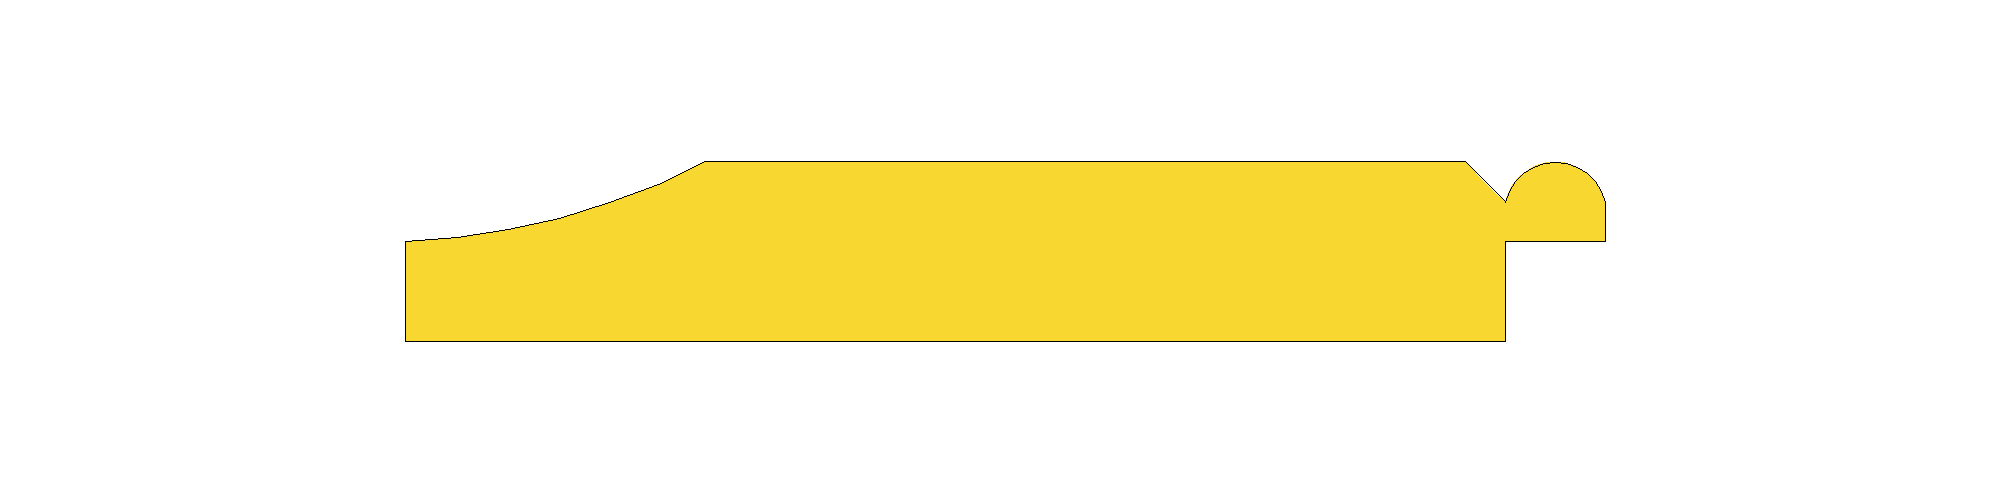 voodrilaud uykh 18x120